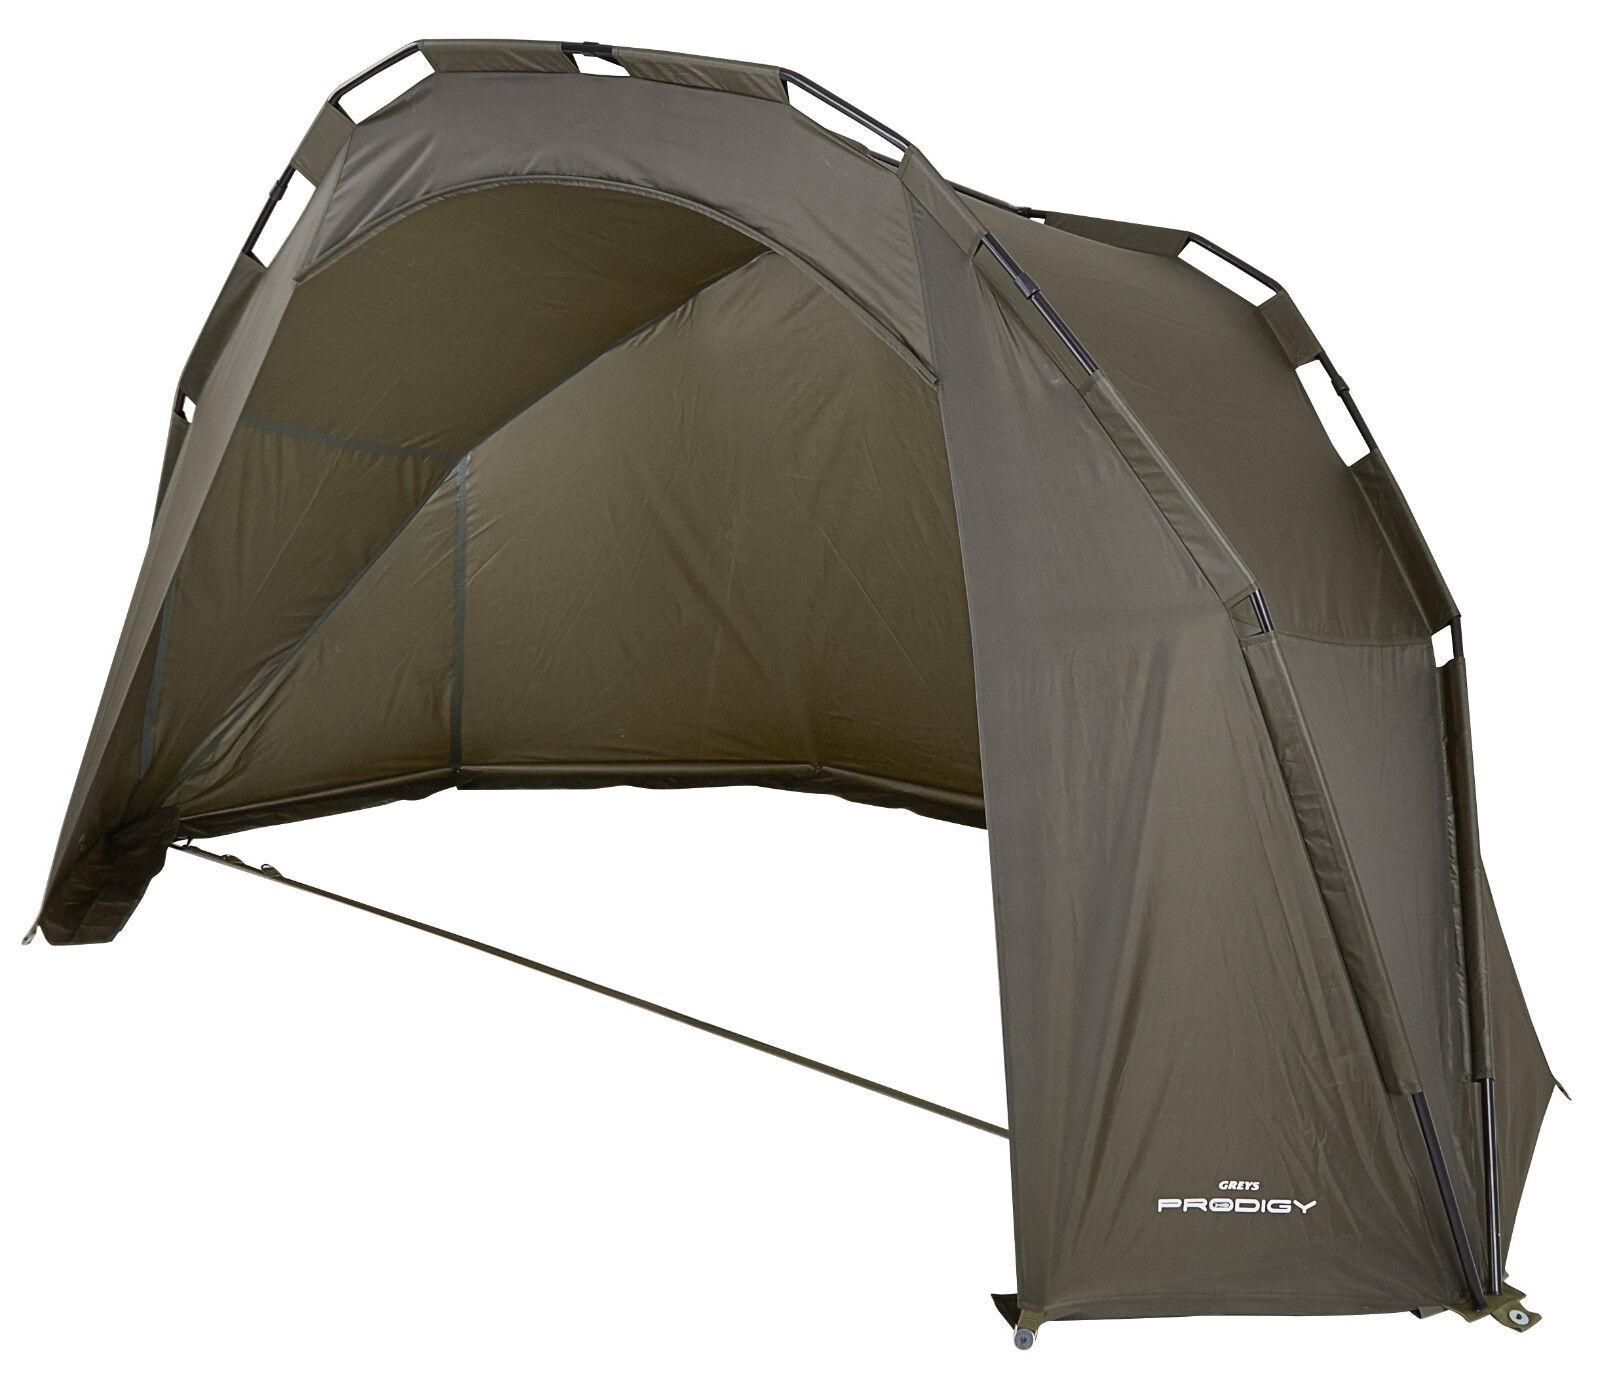 grigios Prodigy Day Shelter 1406934 Ombrello Umbrella Angel ombrello Carpa OMBRELLO